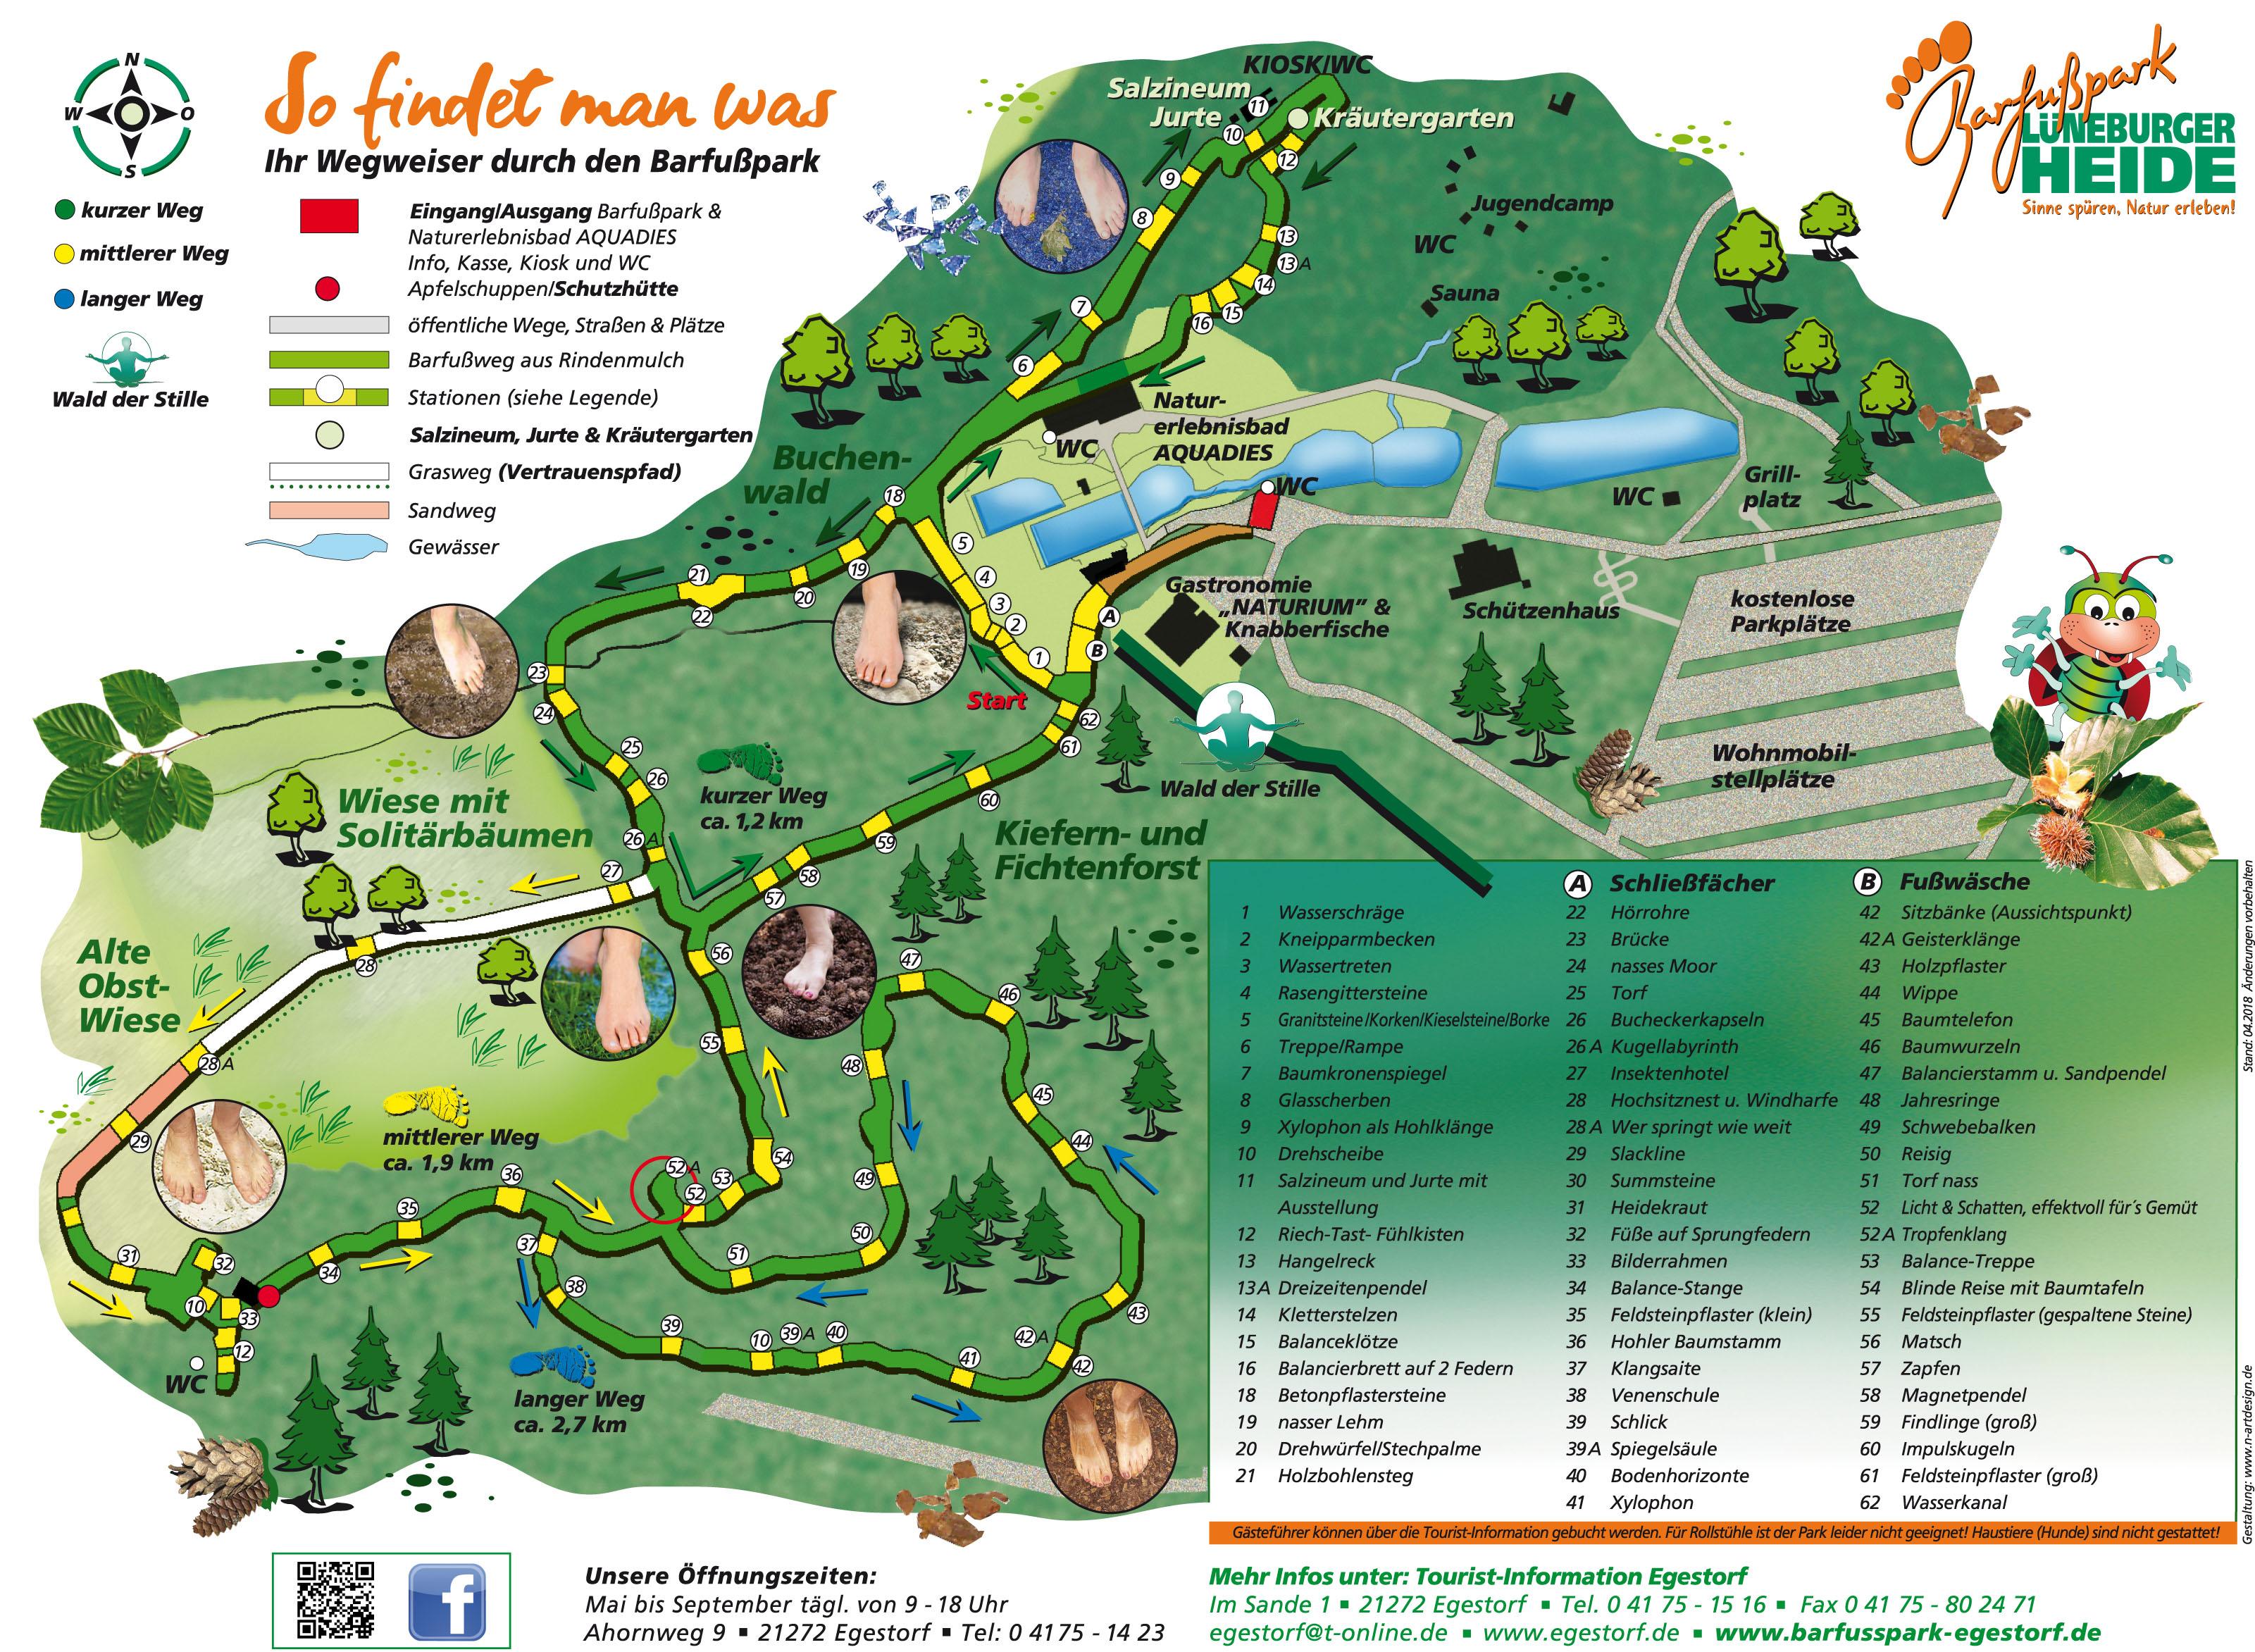 Karte Lüneburger Heide Und Umgebung.Barfusspark Lüneburger Heide Egestorf Freizeitpark Niedersachsen